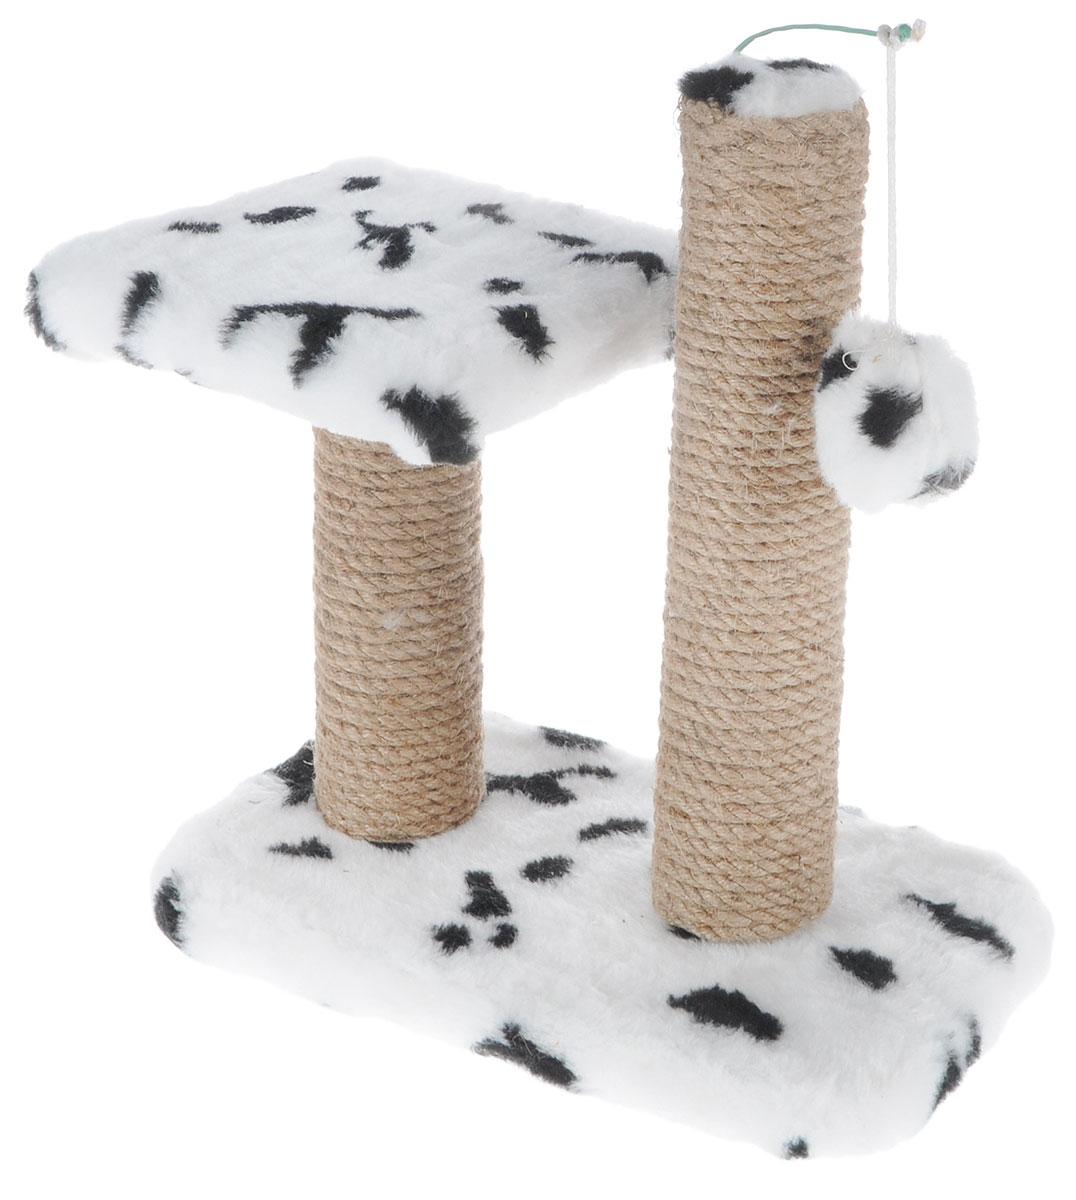 Когтеточка для котят Меридиан, двойная, цвет: белый, черный, бежевый, 30 х 20 х 34 см когтеточка для котят меридиан цветы двойная цвет белый светло коричневый 30 х 20 х 34 см